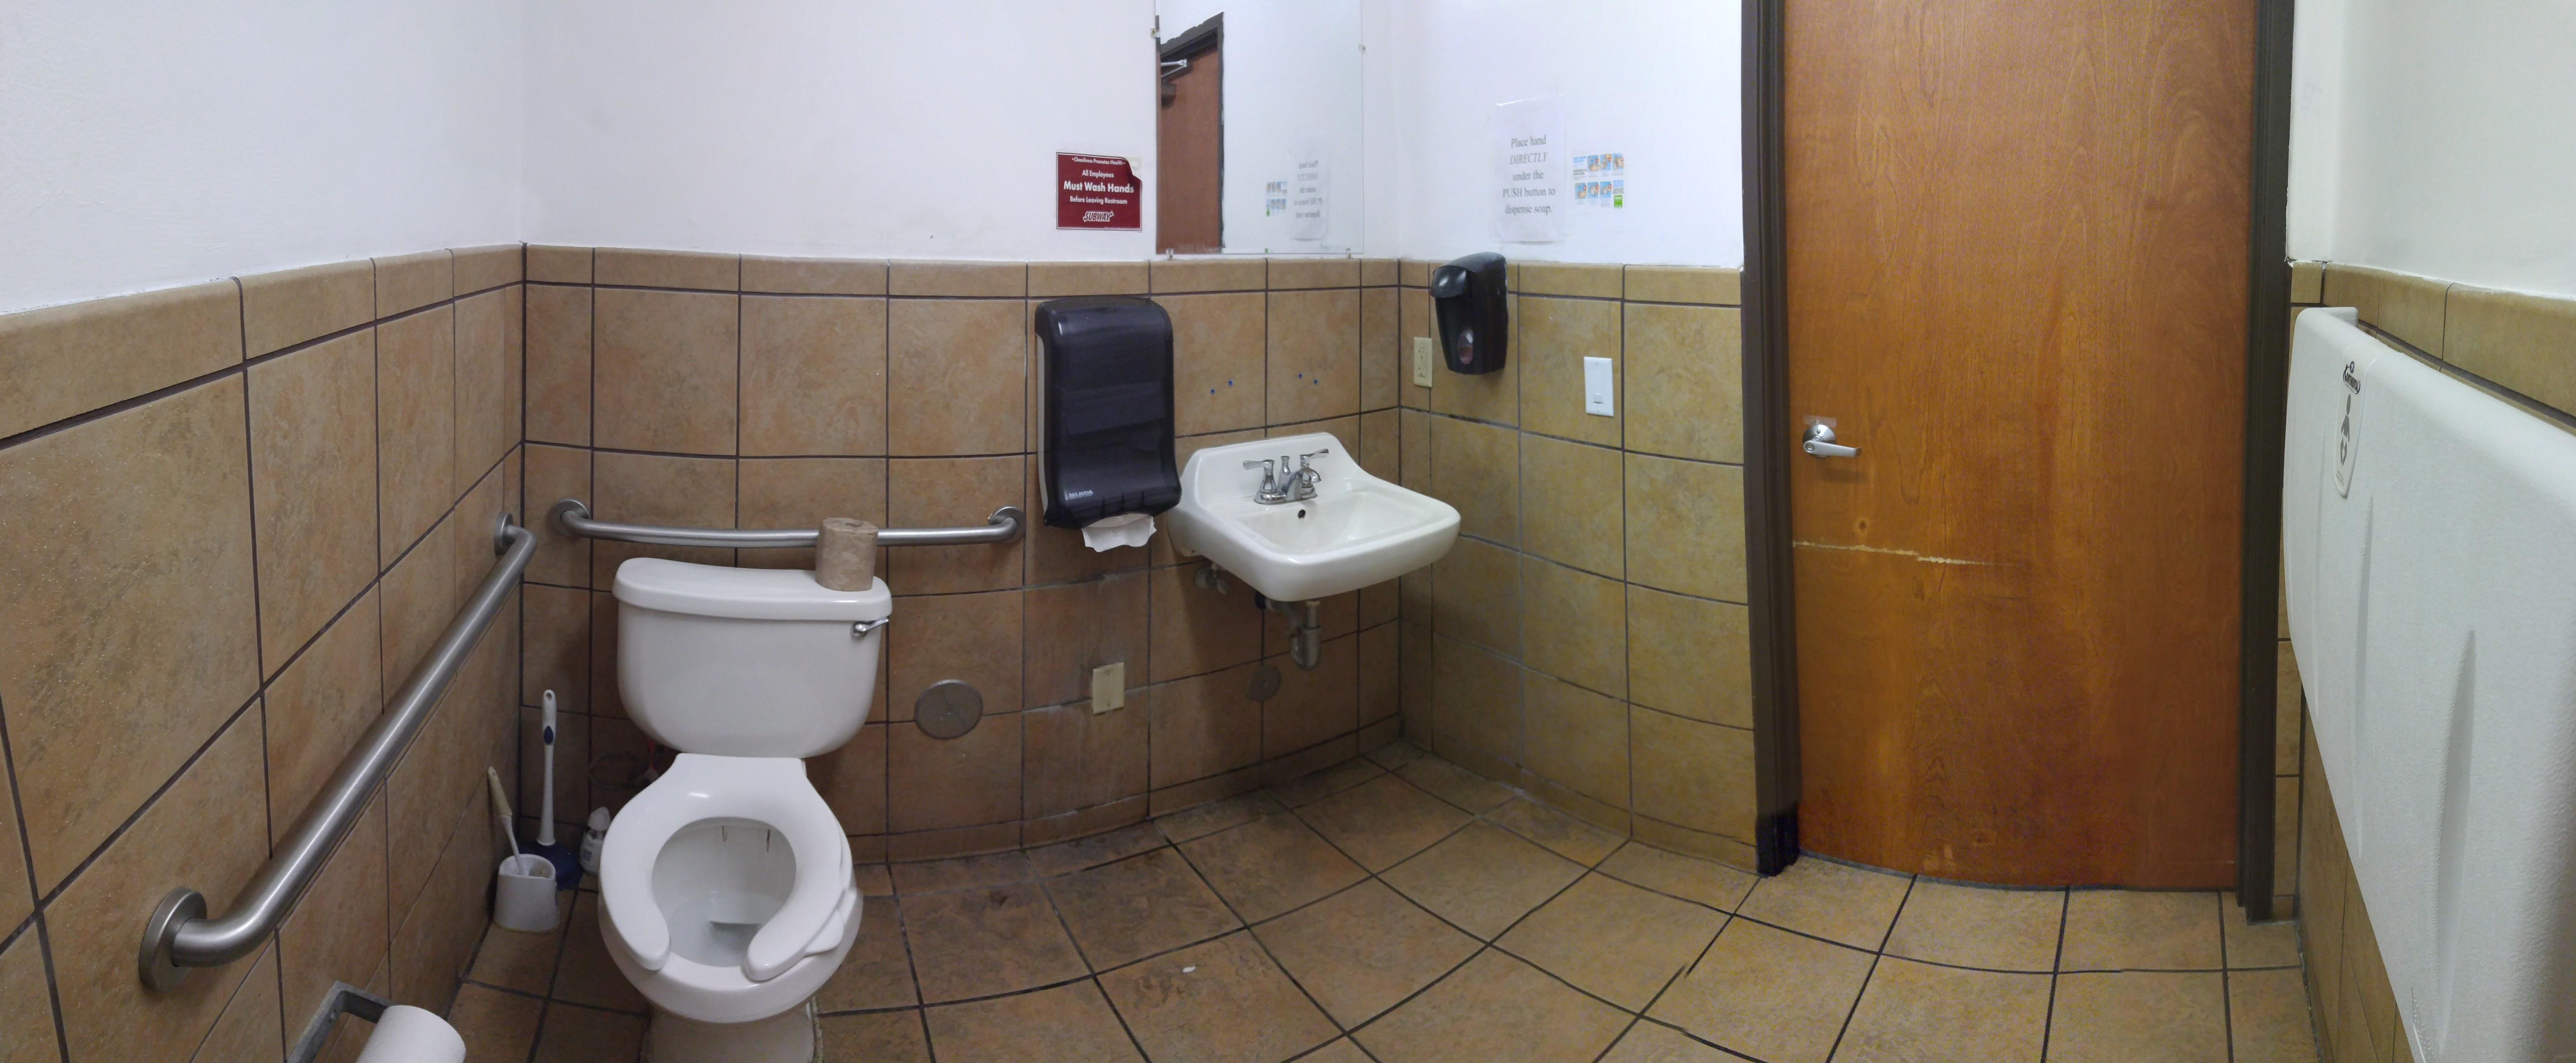 California Bathroom restaurant at williams, california - bathroom review